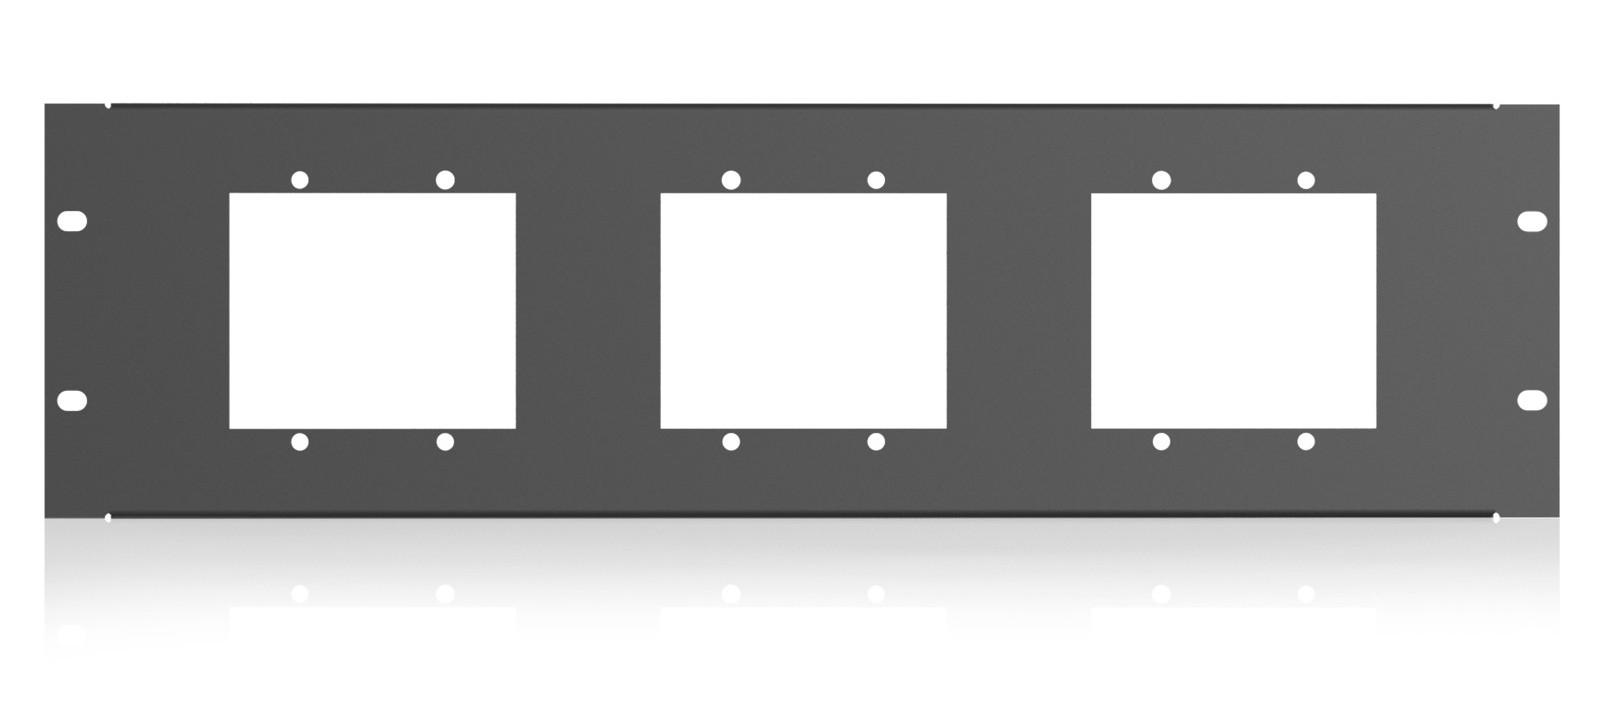 3RU Rack Mount Kit for BlueBridge Wall Plate Controllers